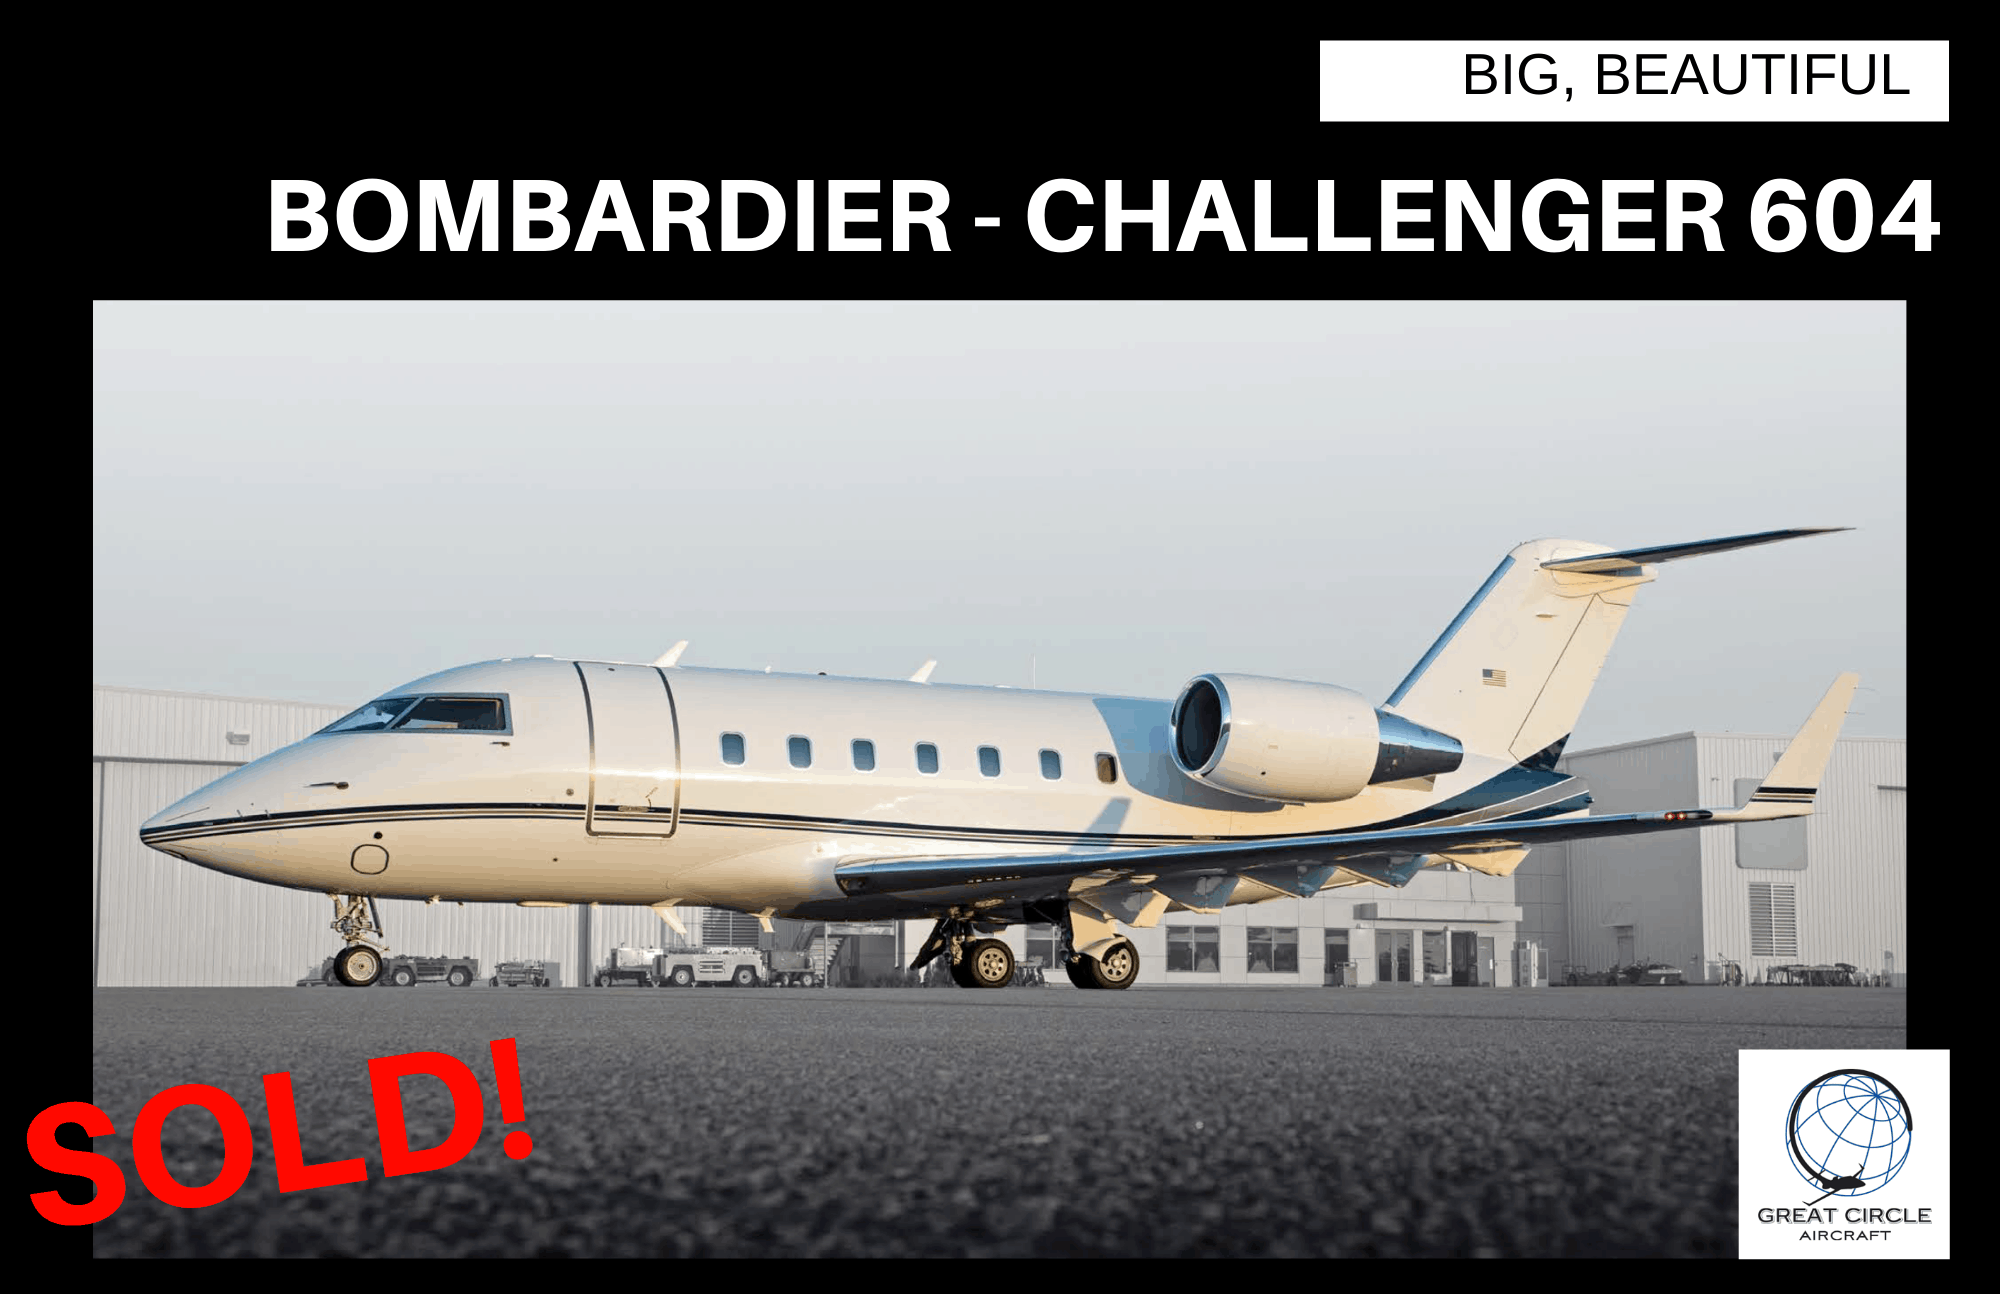 2004 Bombardier Challenger 604